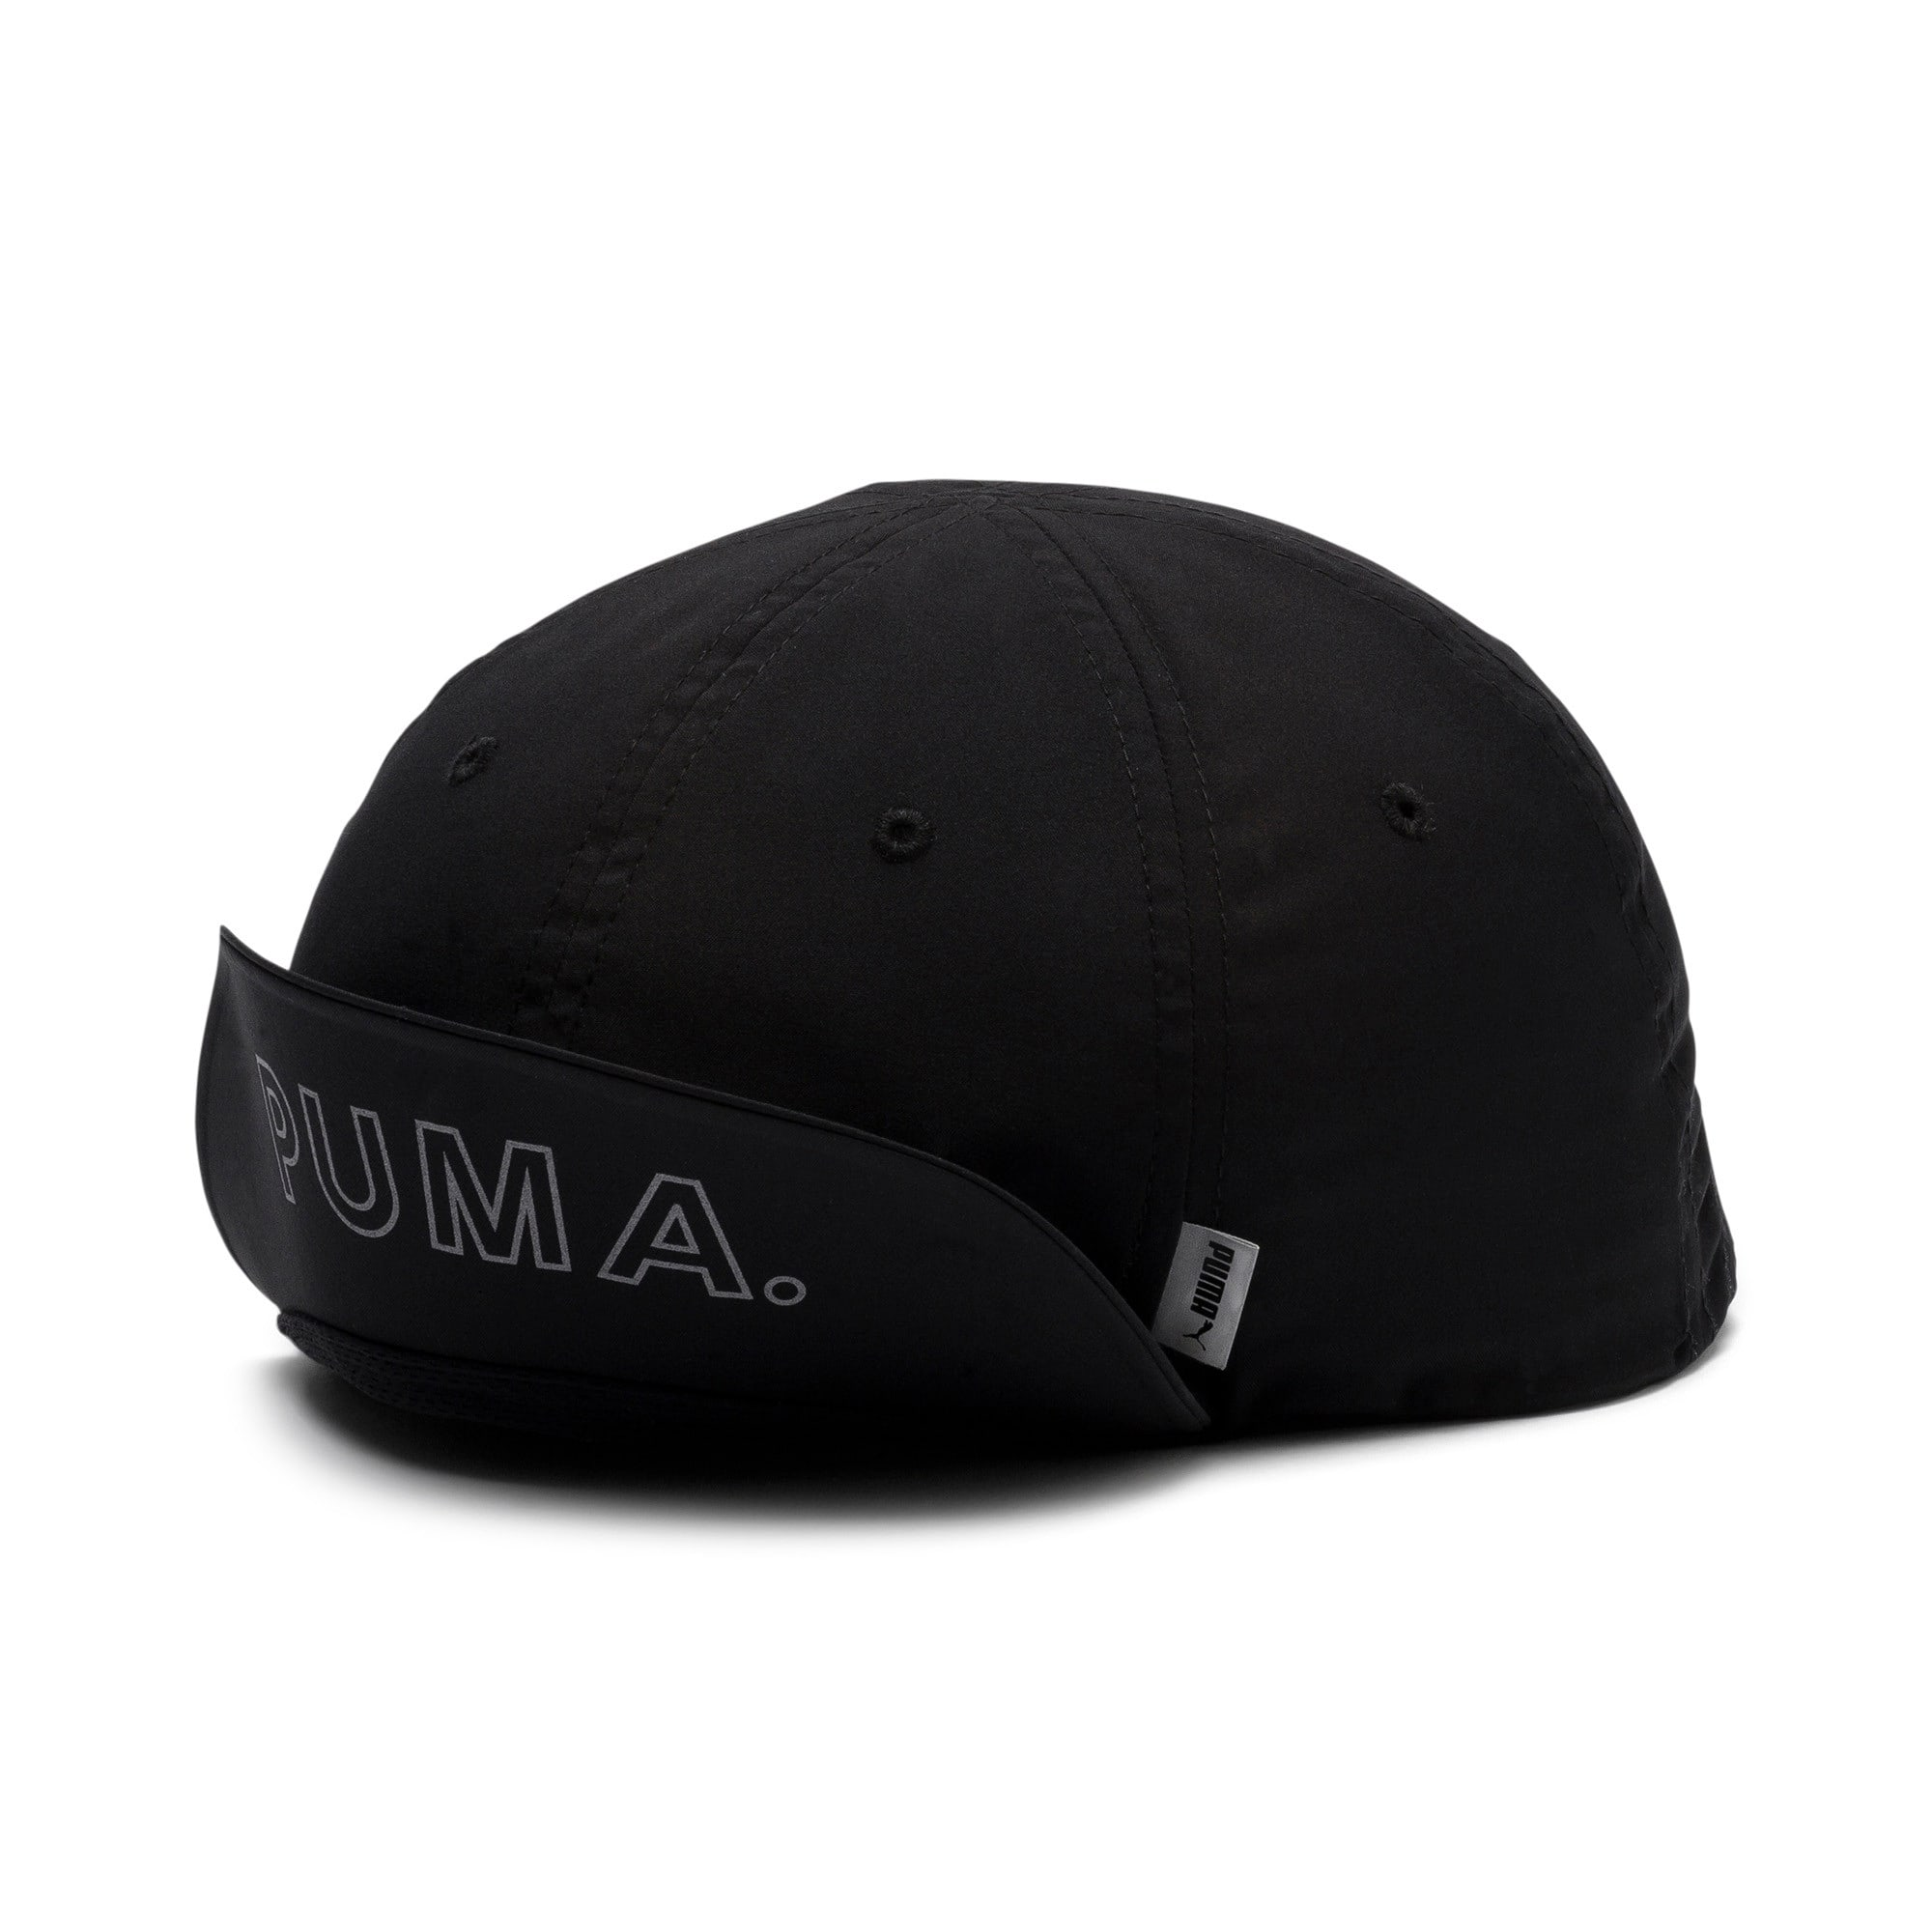 Thumbnail 1 of Epoch Low Curve Cap, Puma Black, medium-IND